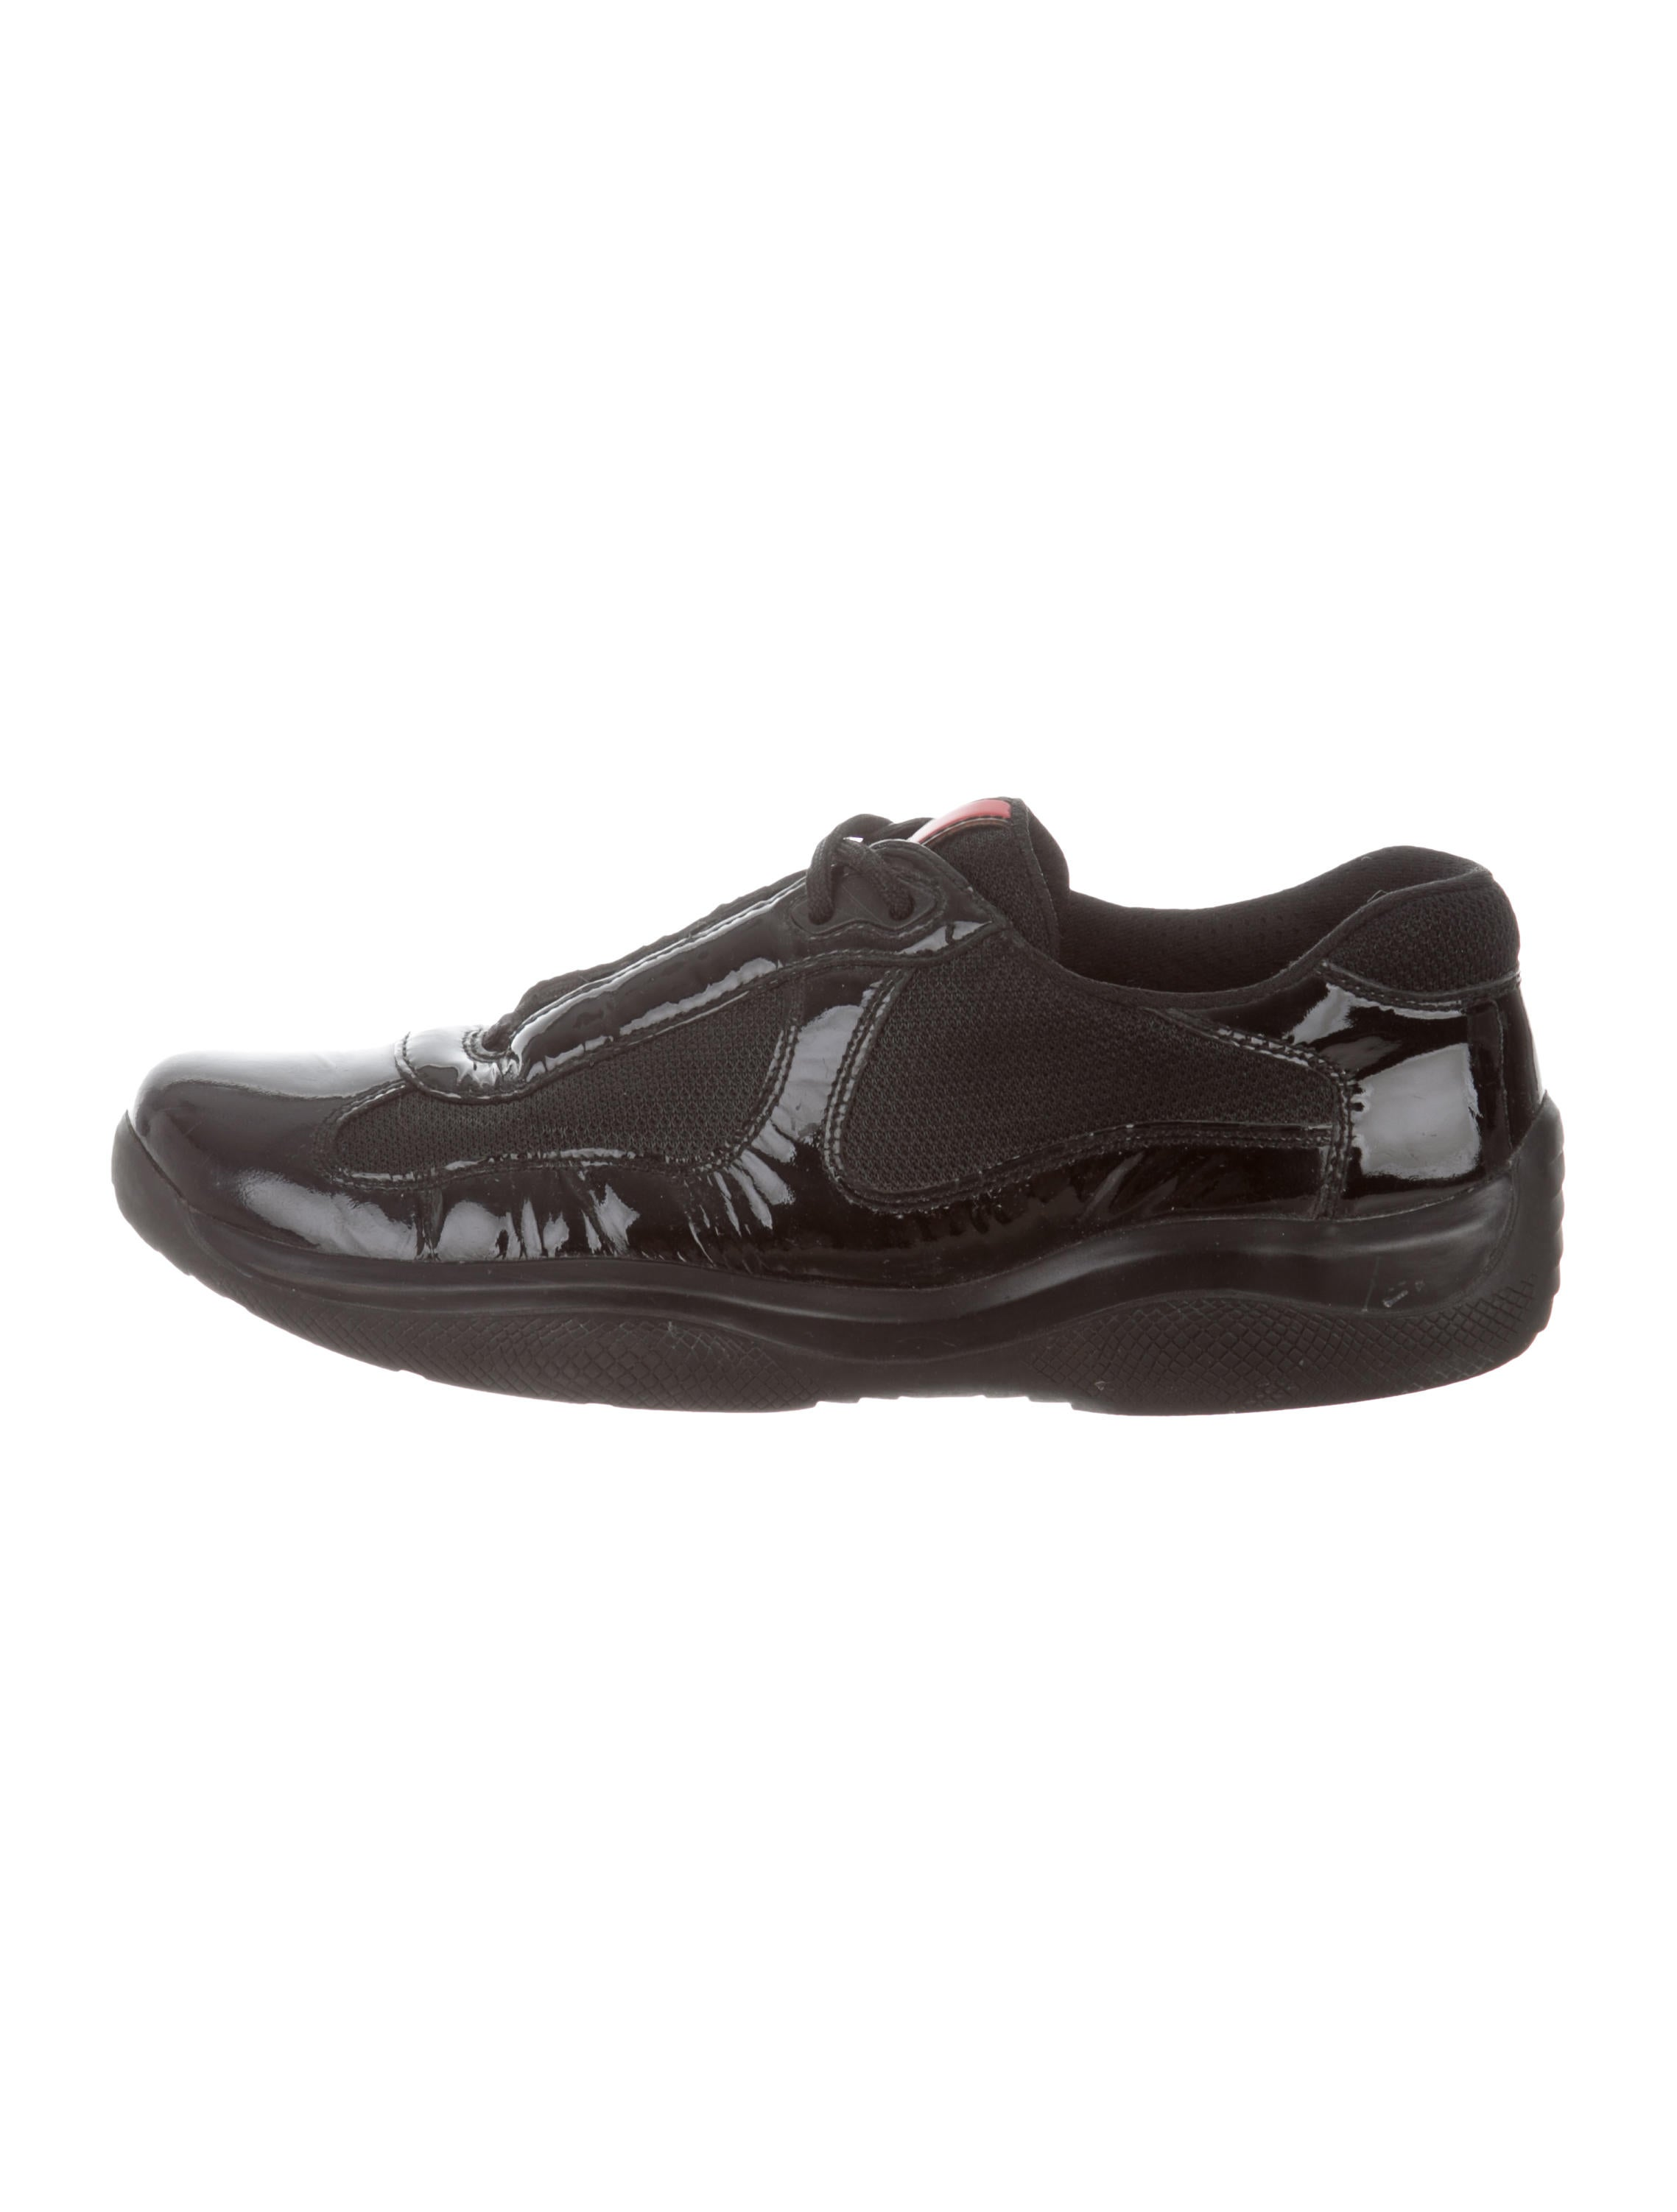 8cb62394fc18de Prada Sport America s Cup Sneakers - Shoes - WPR62703